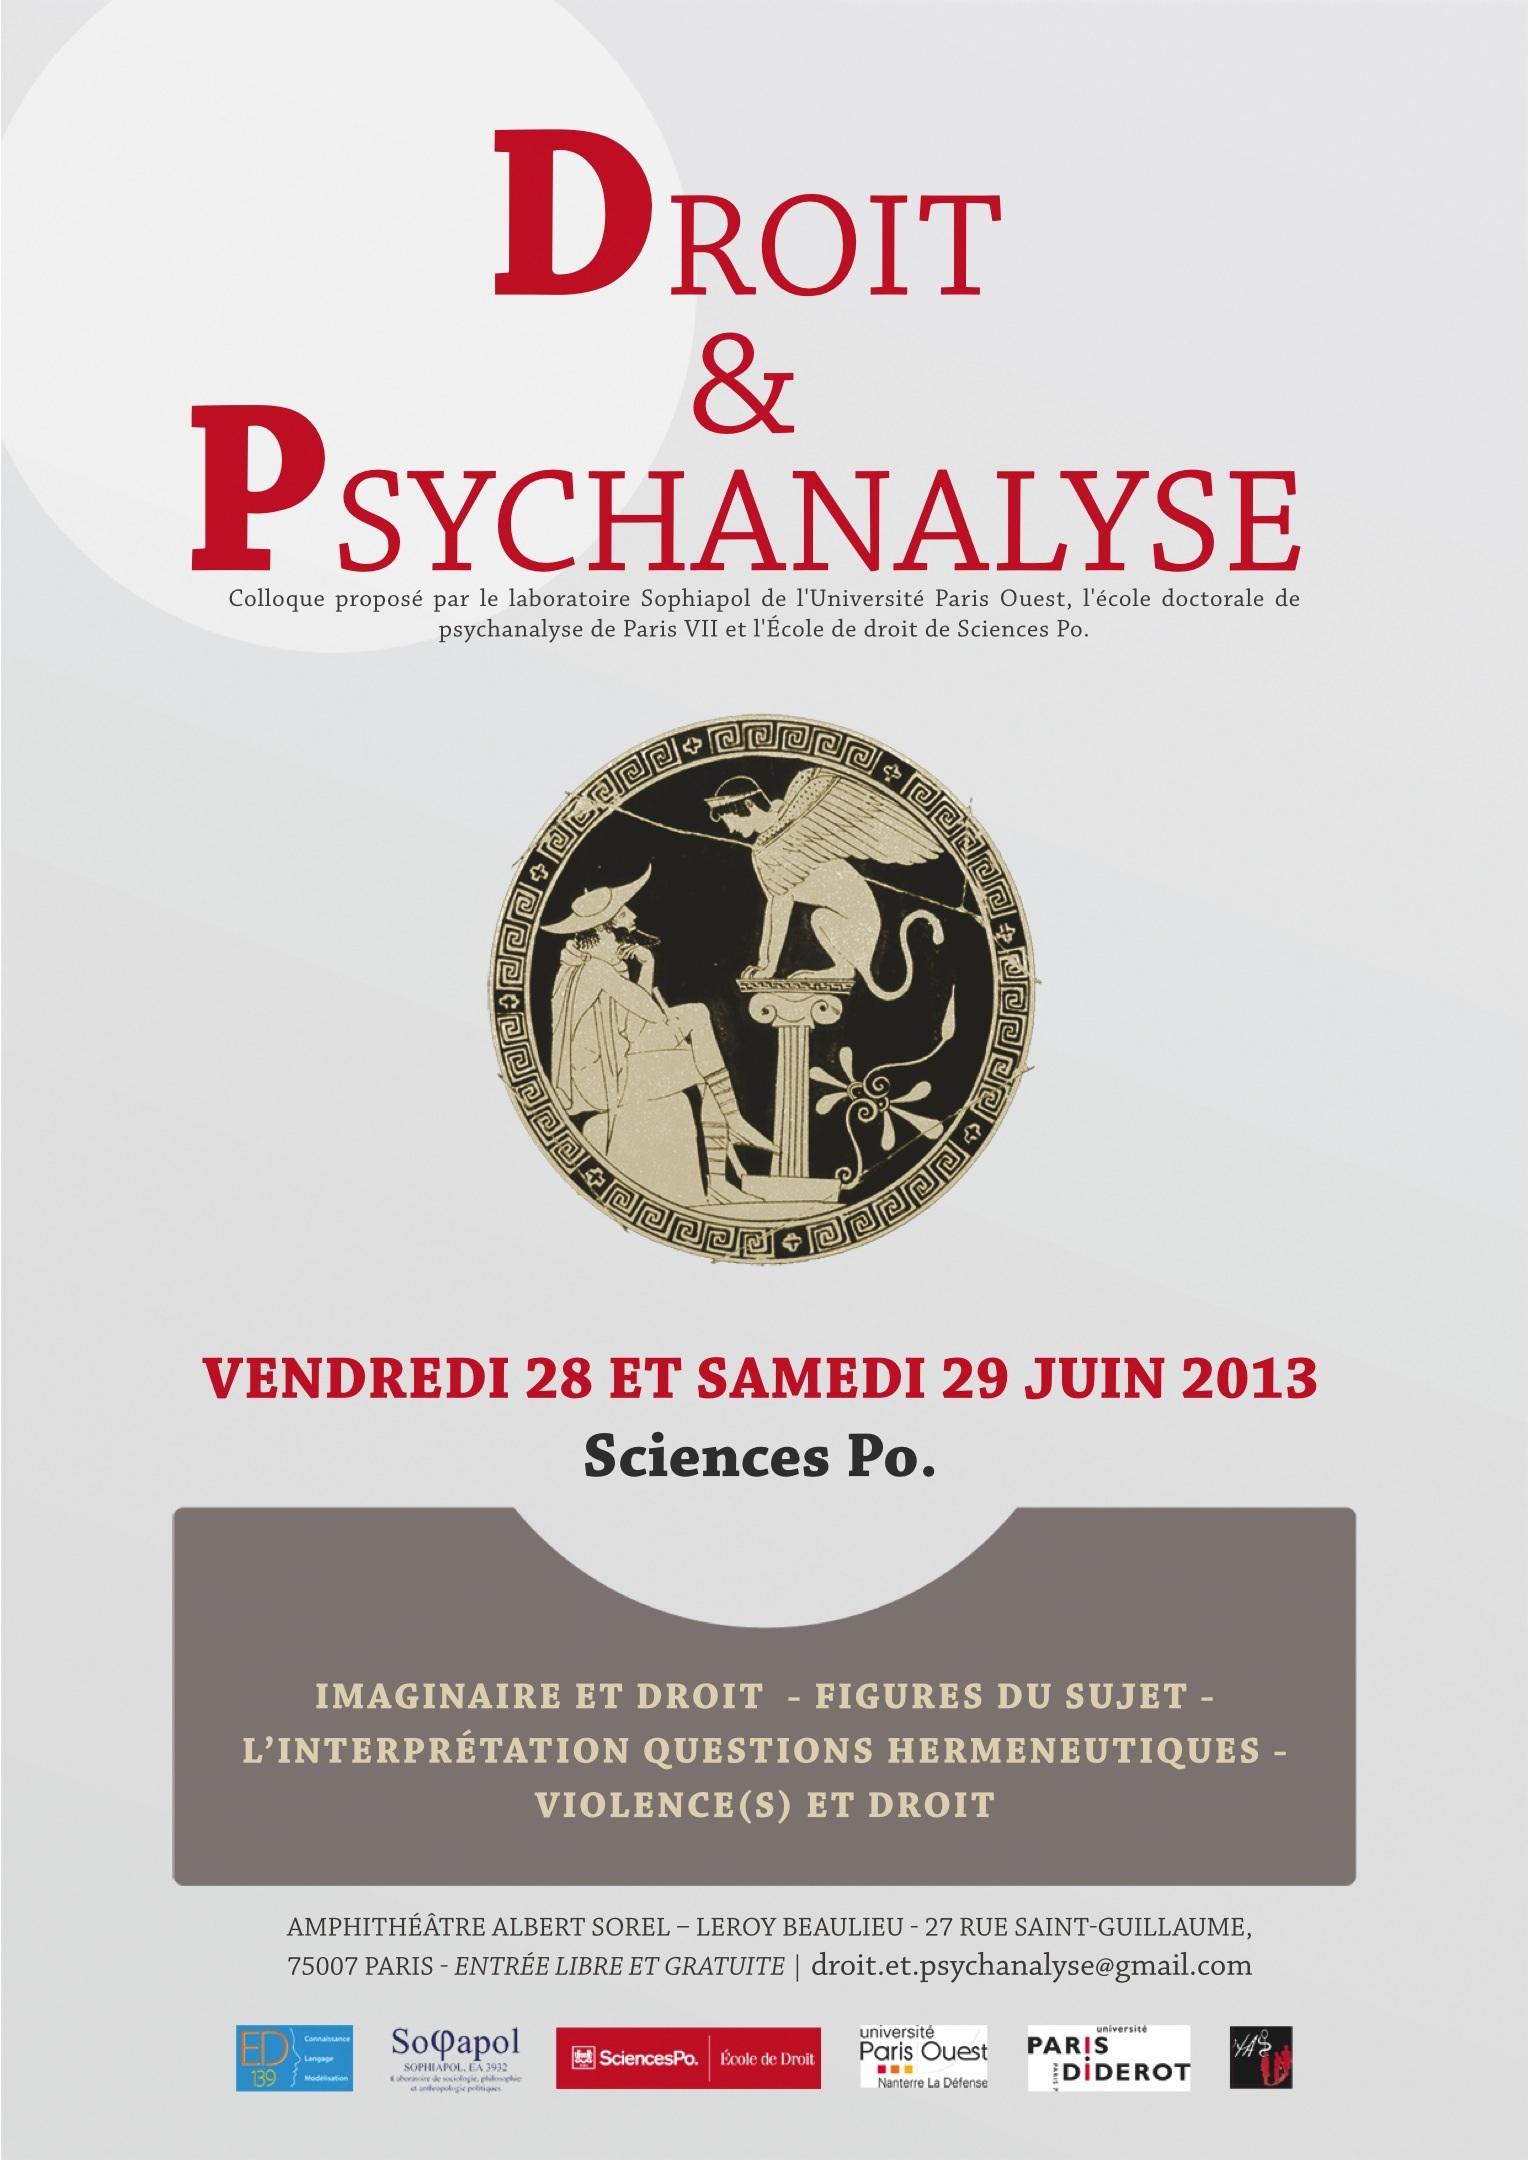 affiche_droit_psychanalyse